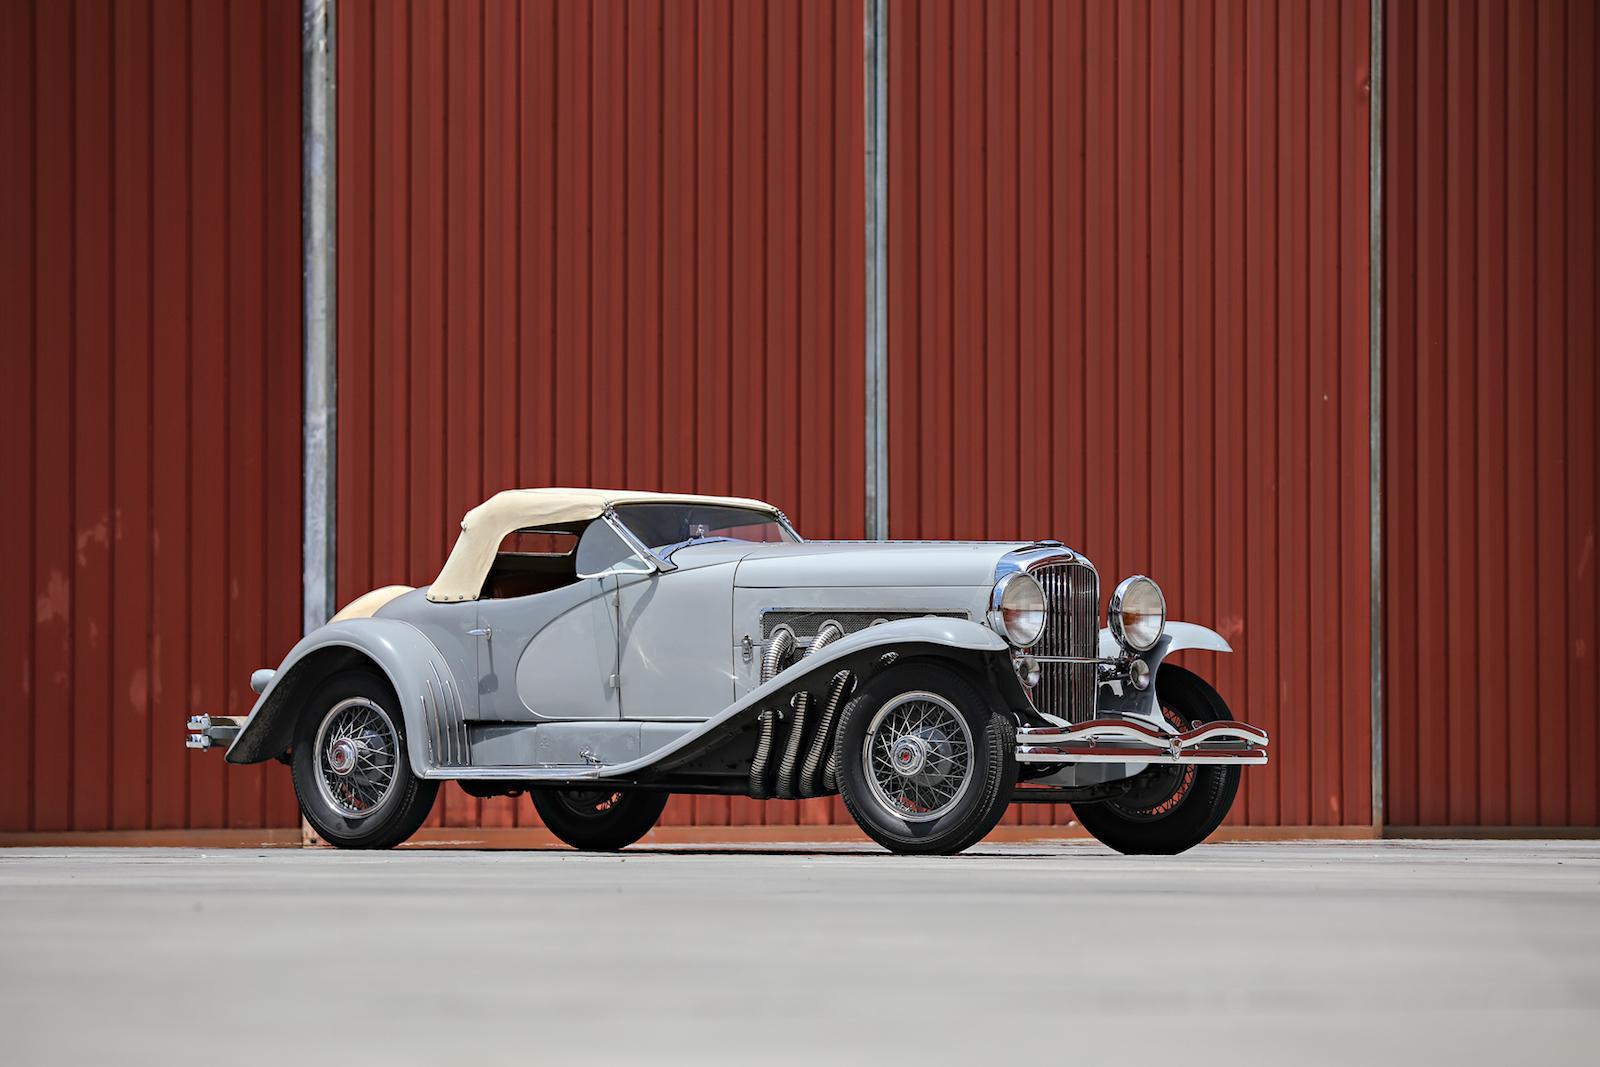 1935 duesenberg ssj the most expensive american car ever sold at auction live trading news. Black Bedroom Furniture Sets. Home Design Ideas